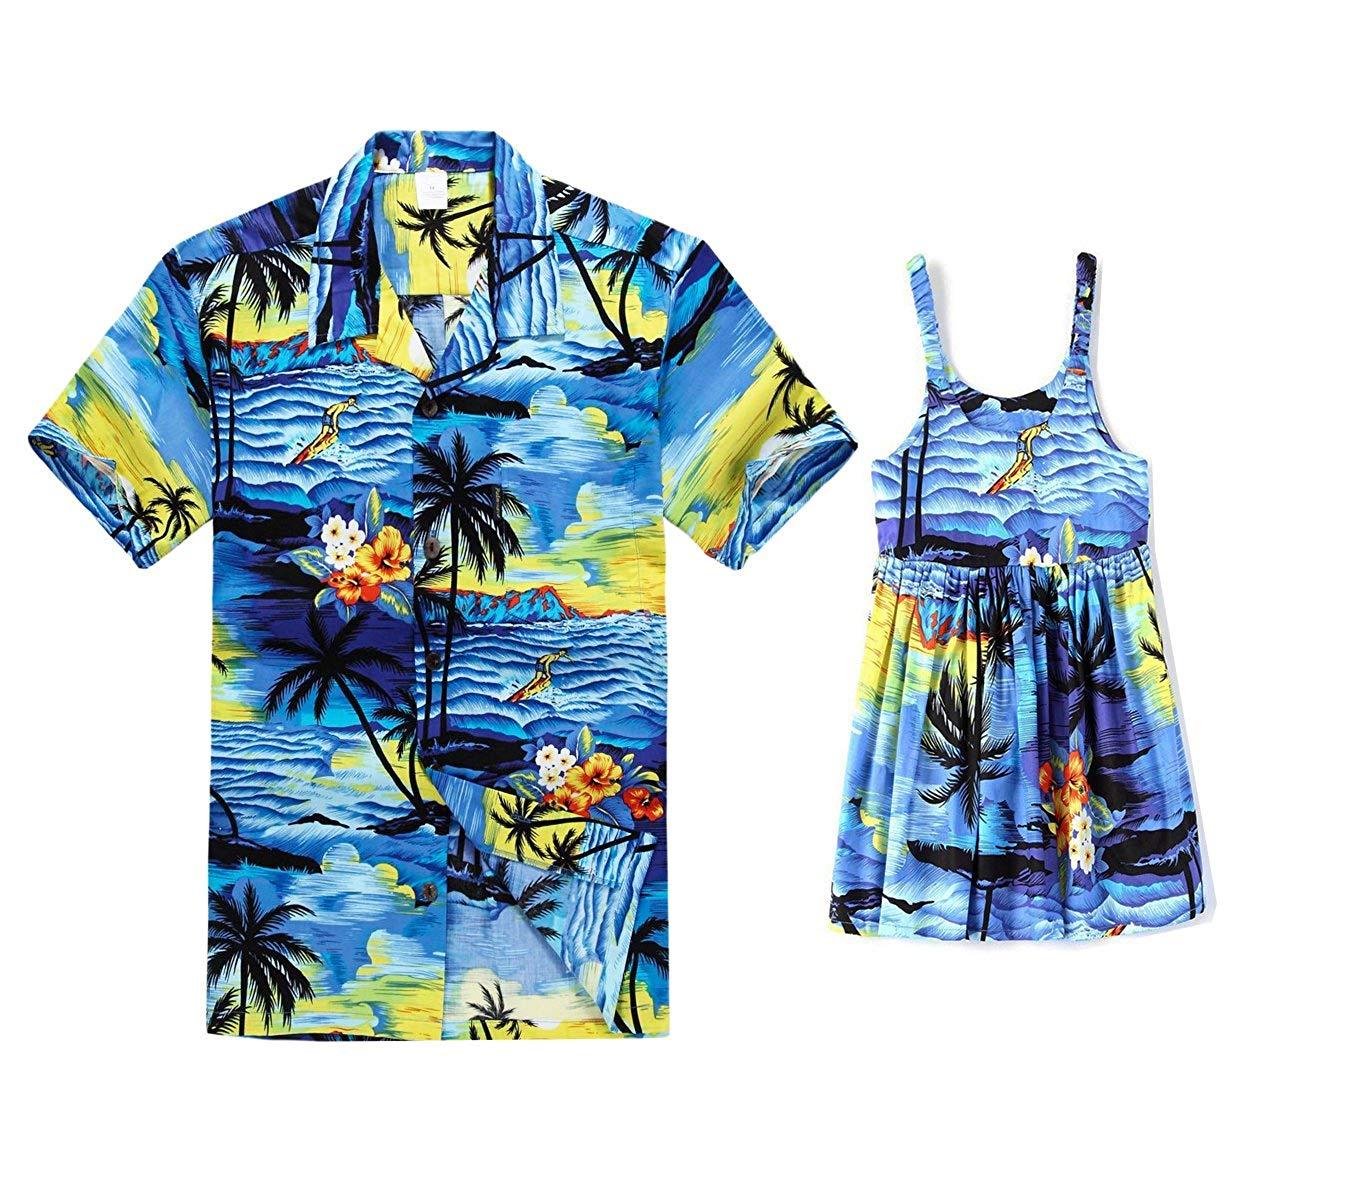 3f1603d2 Get Quotations · Hawaii Hangover Matching Father Daughter Hawaiian Luau  Outfit Men Shirt Girl Dress PW Red Sunset